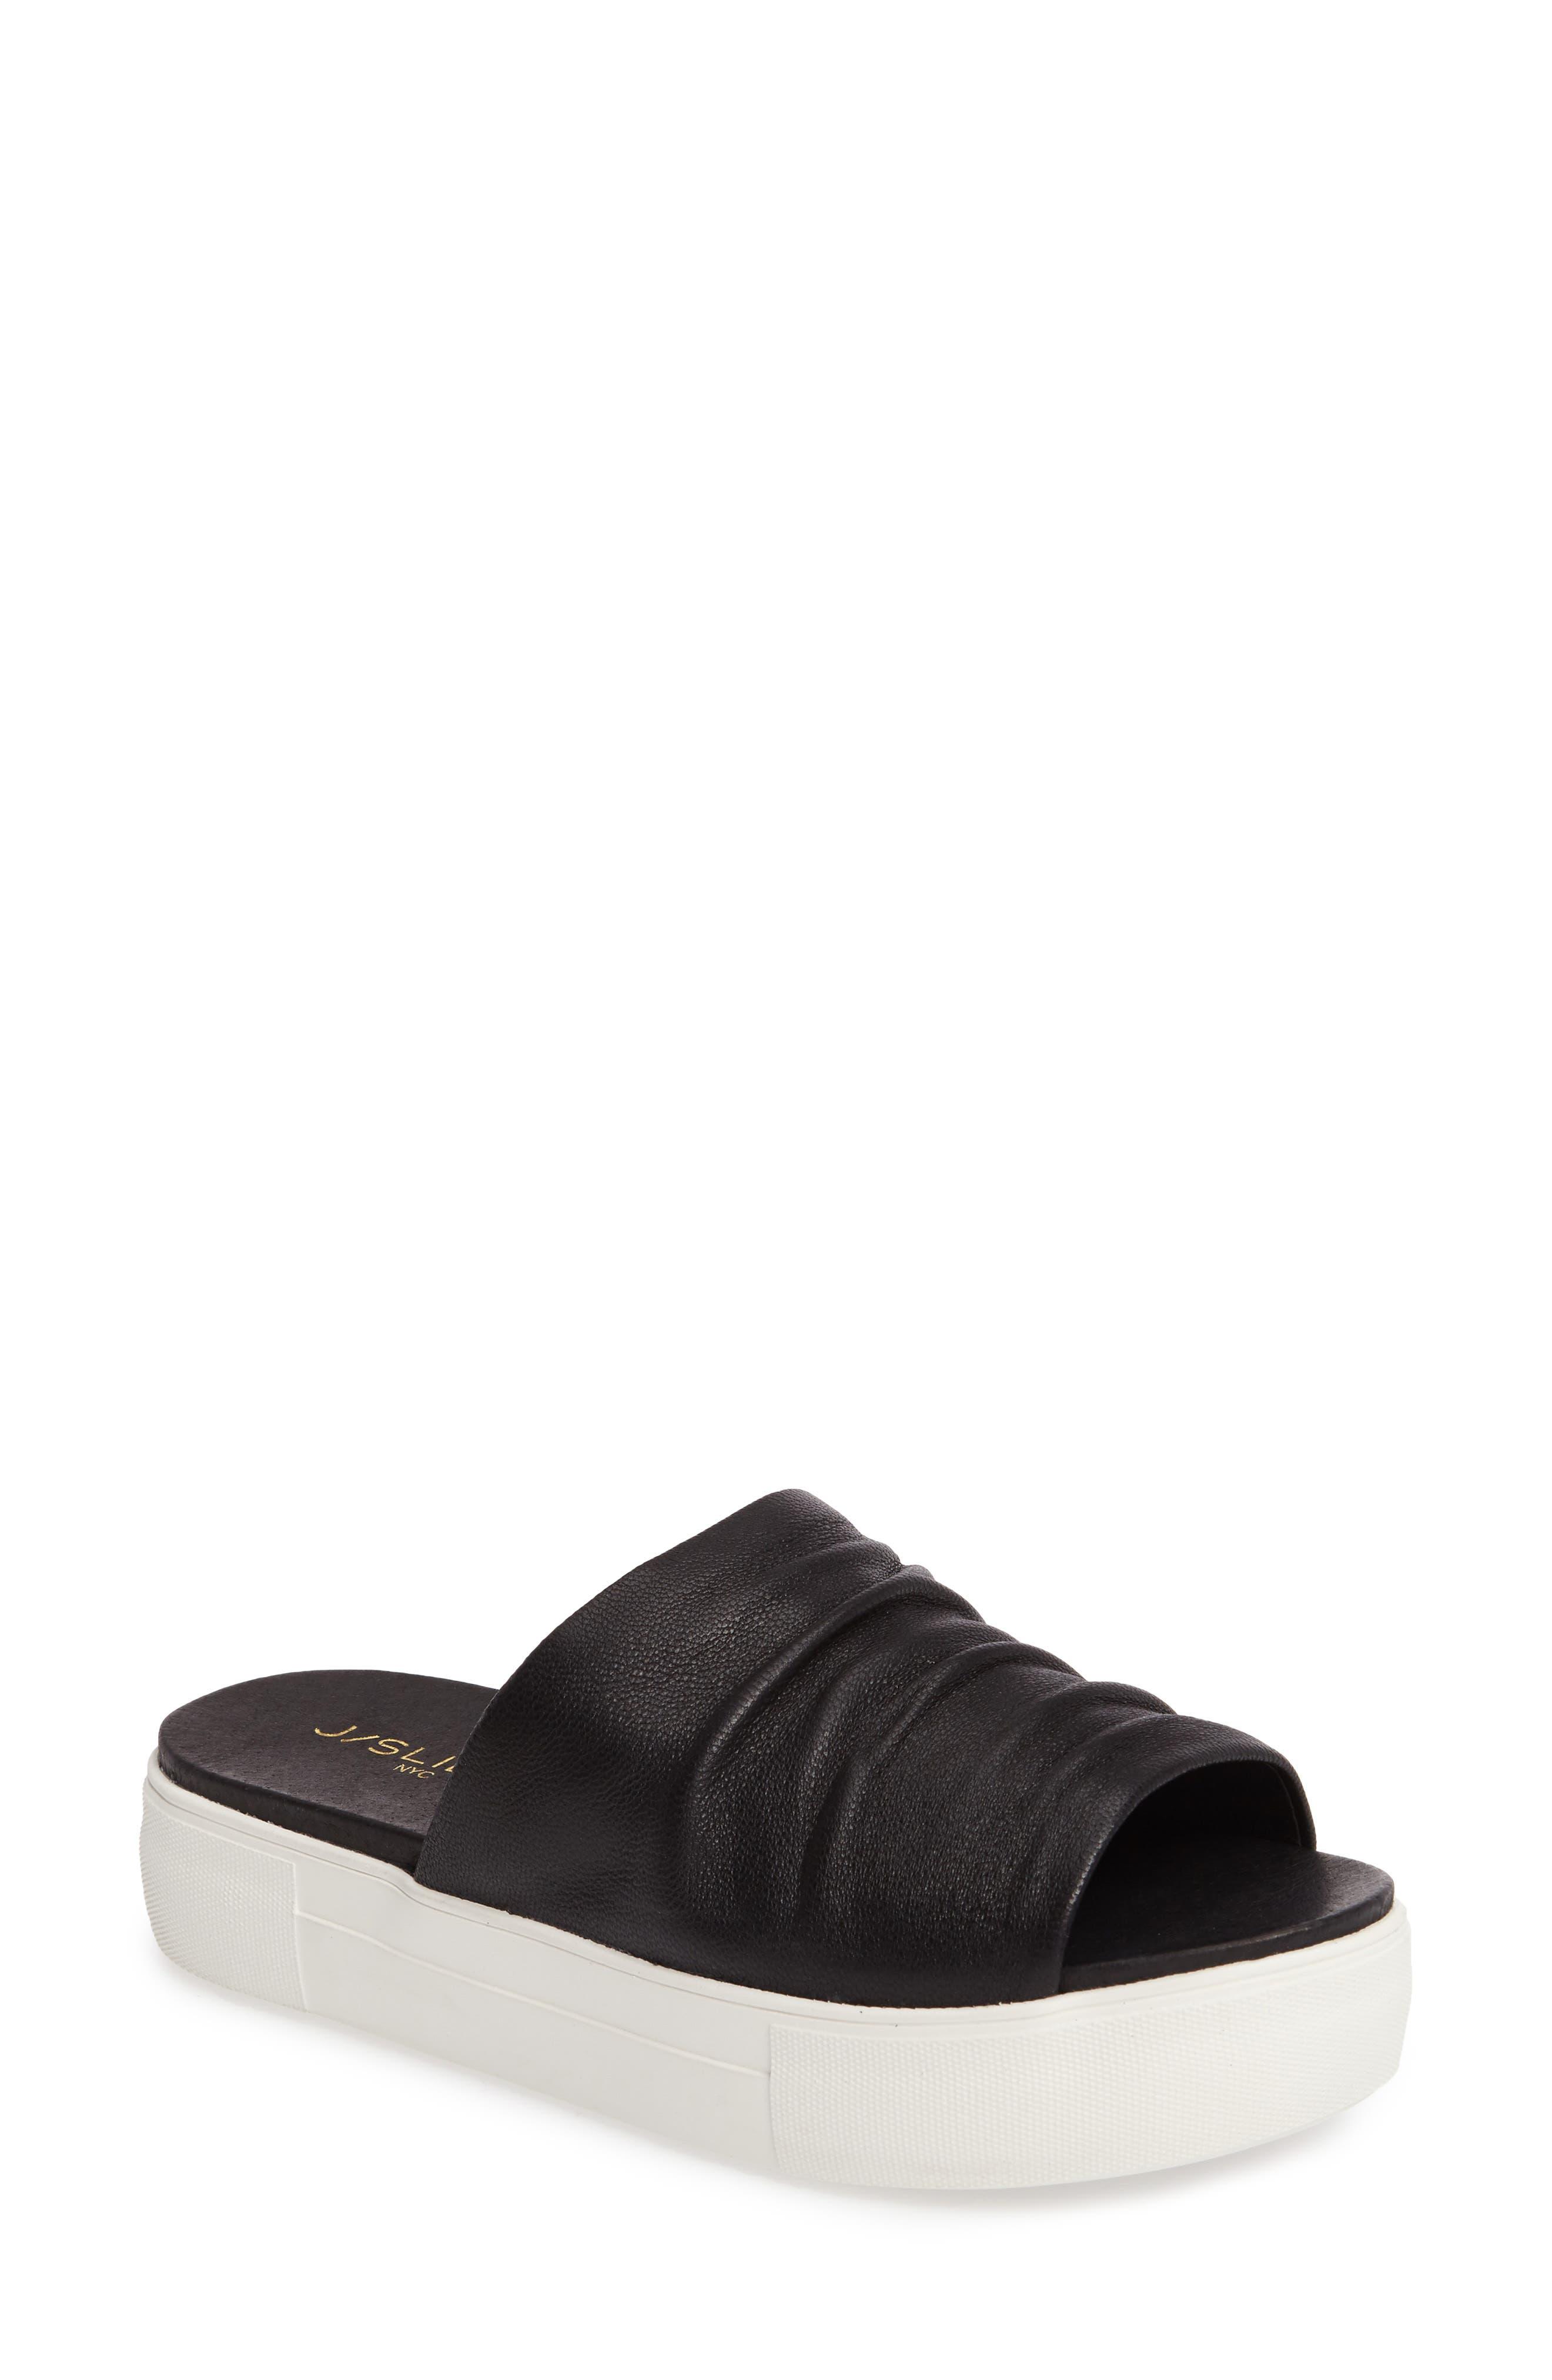 Alura Platform Slide Sandal,                             Main thumbnail 1, color,                             Black Leather